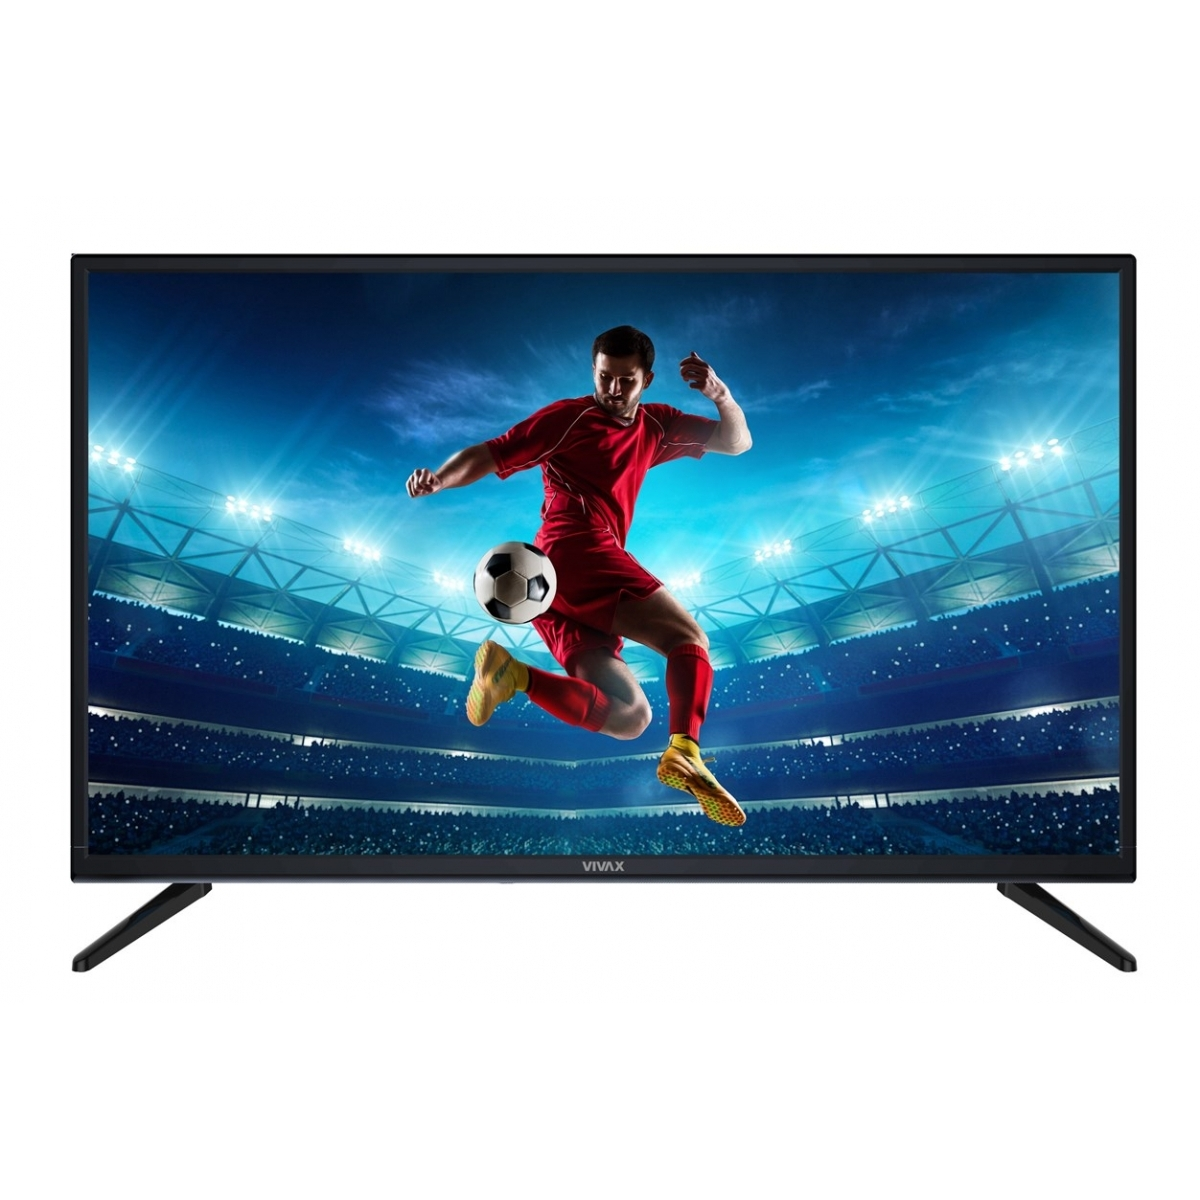 Vivax 32LE79T2 Televizor